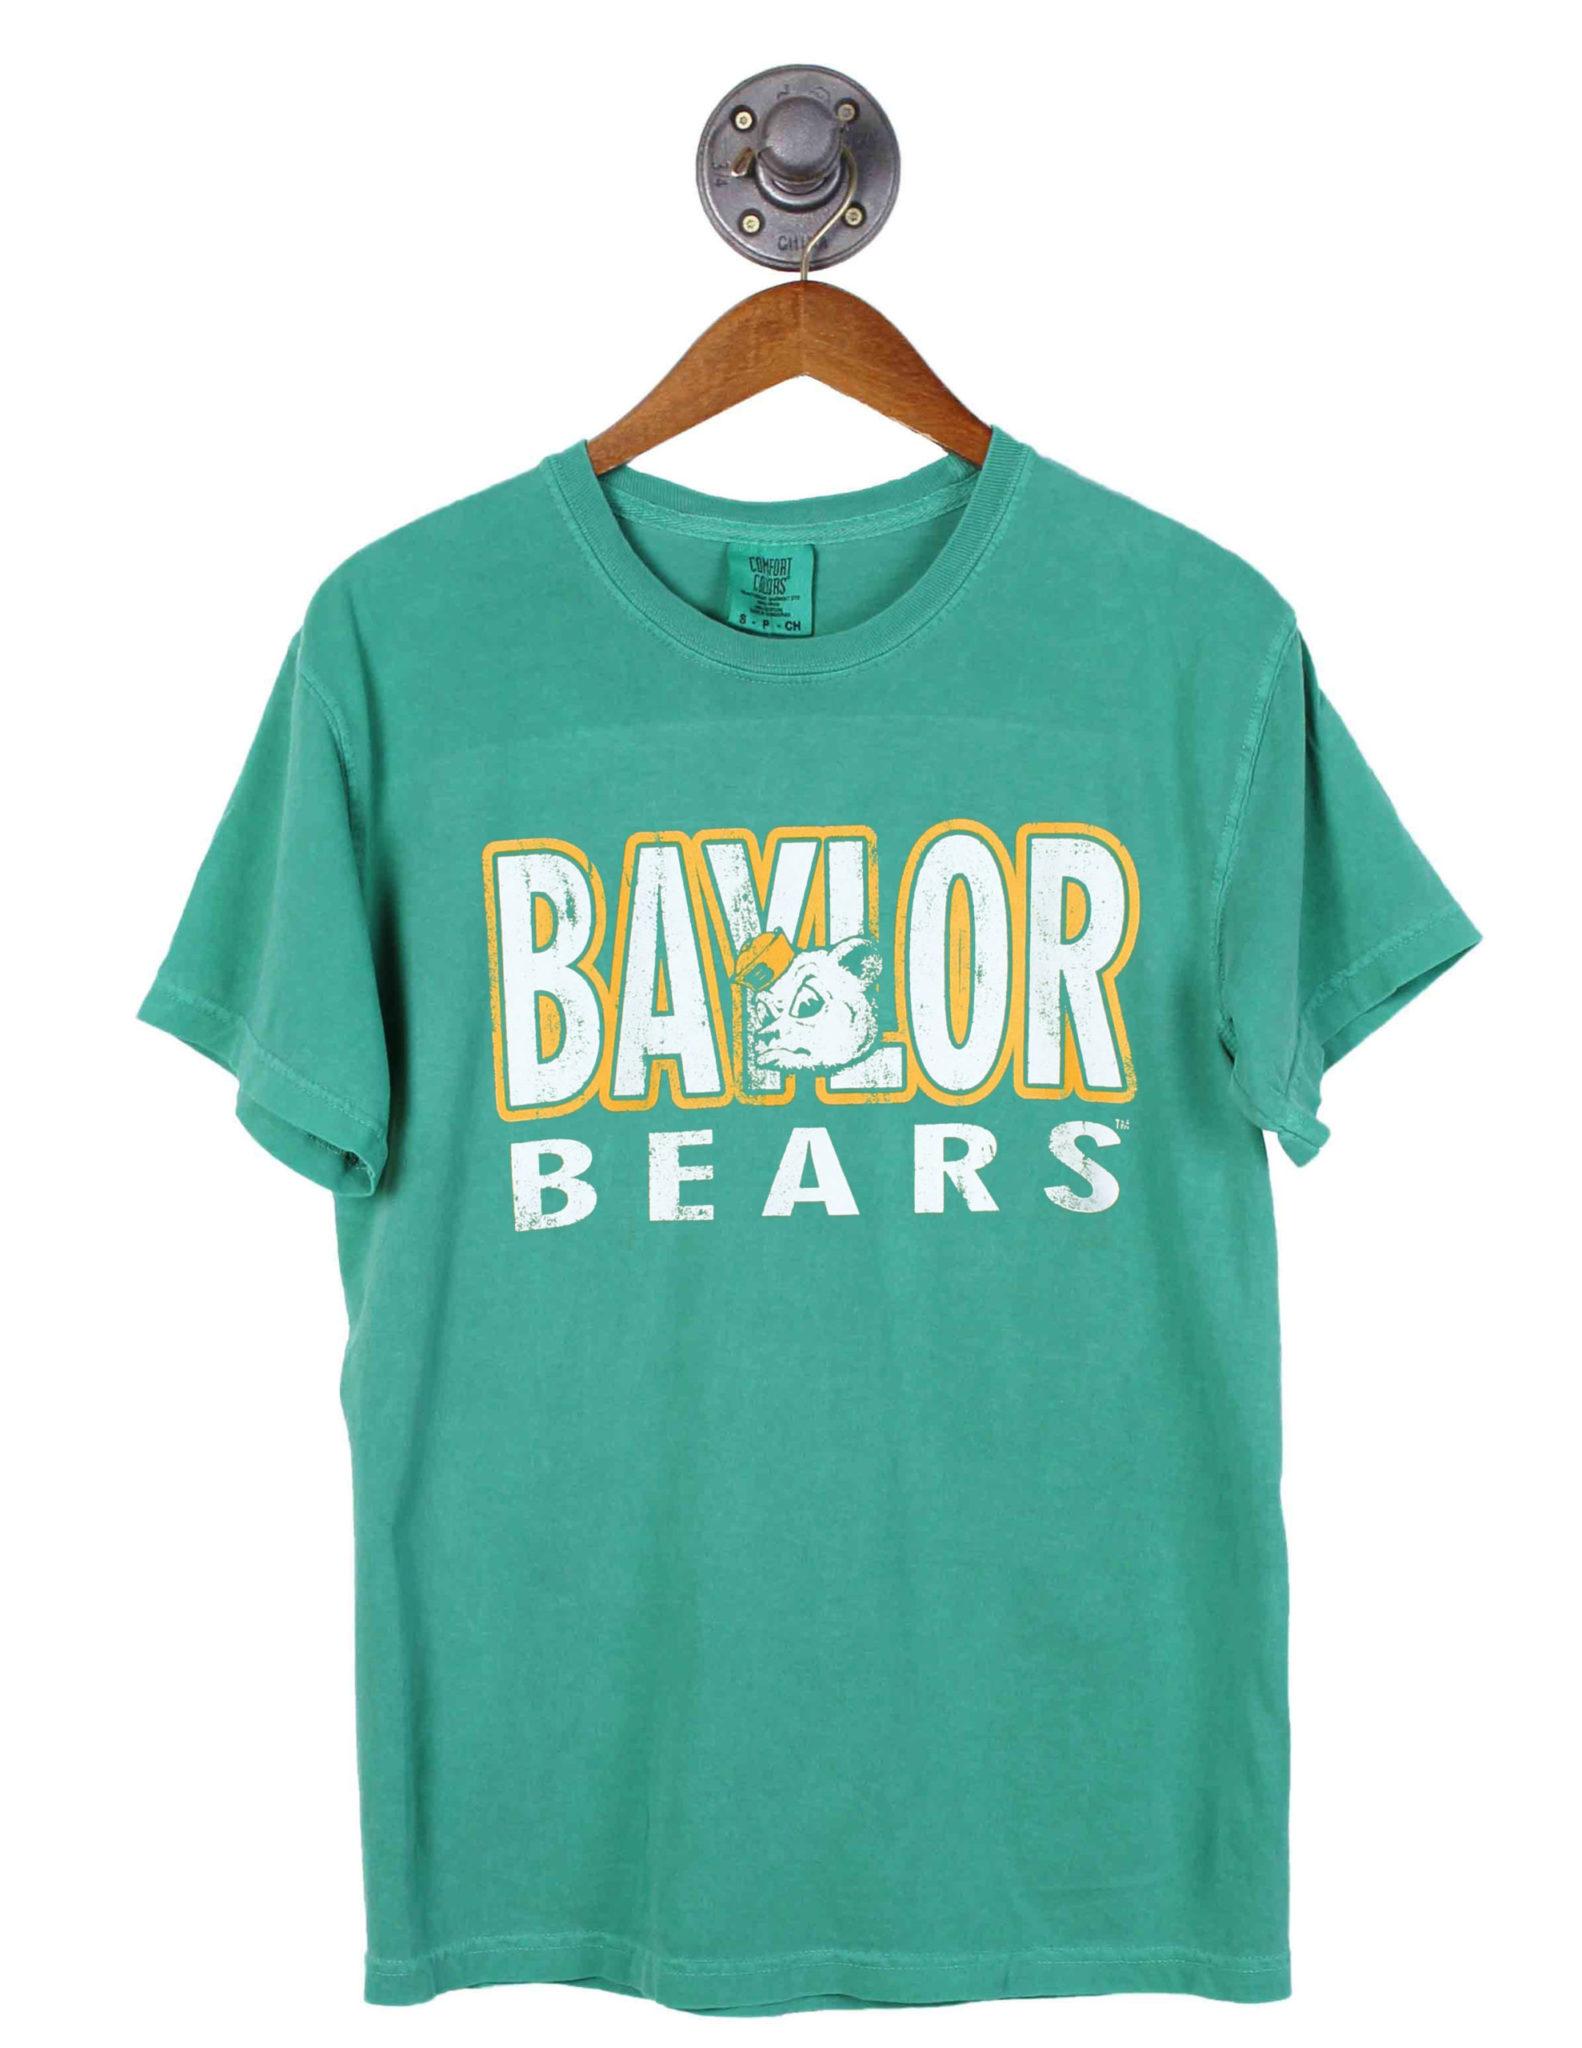 Youth Toddler Baylor Bears Kids Short Sleeve Tee Infant